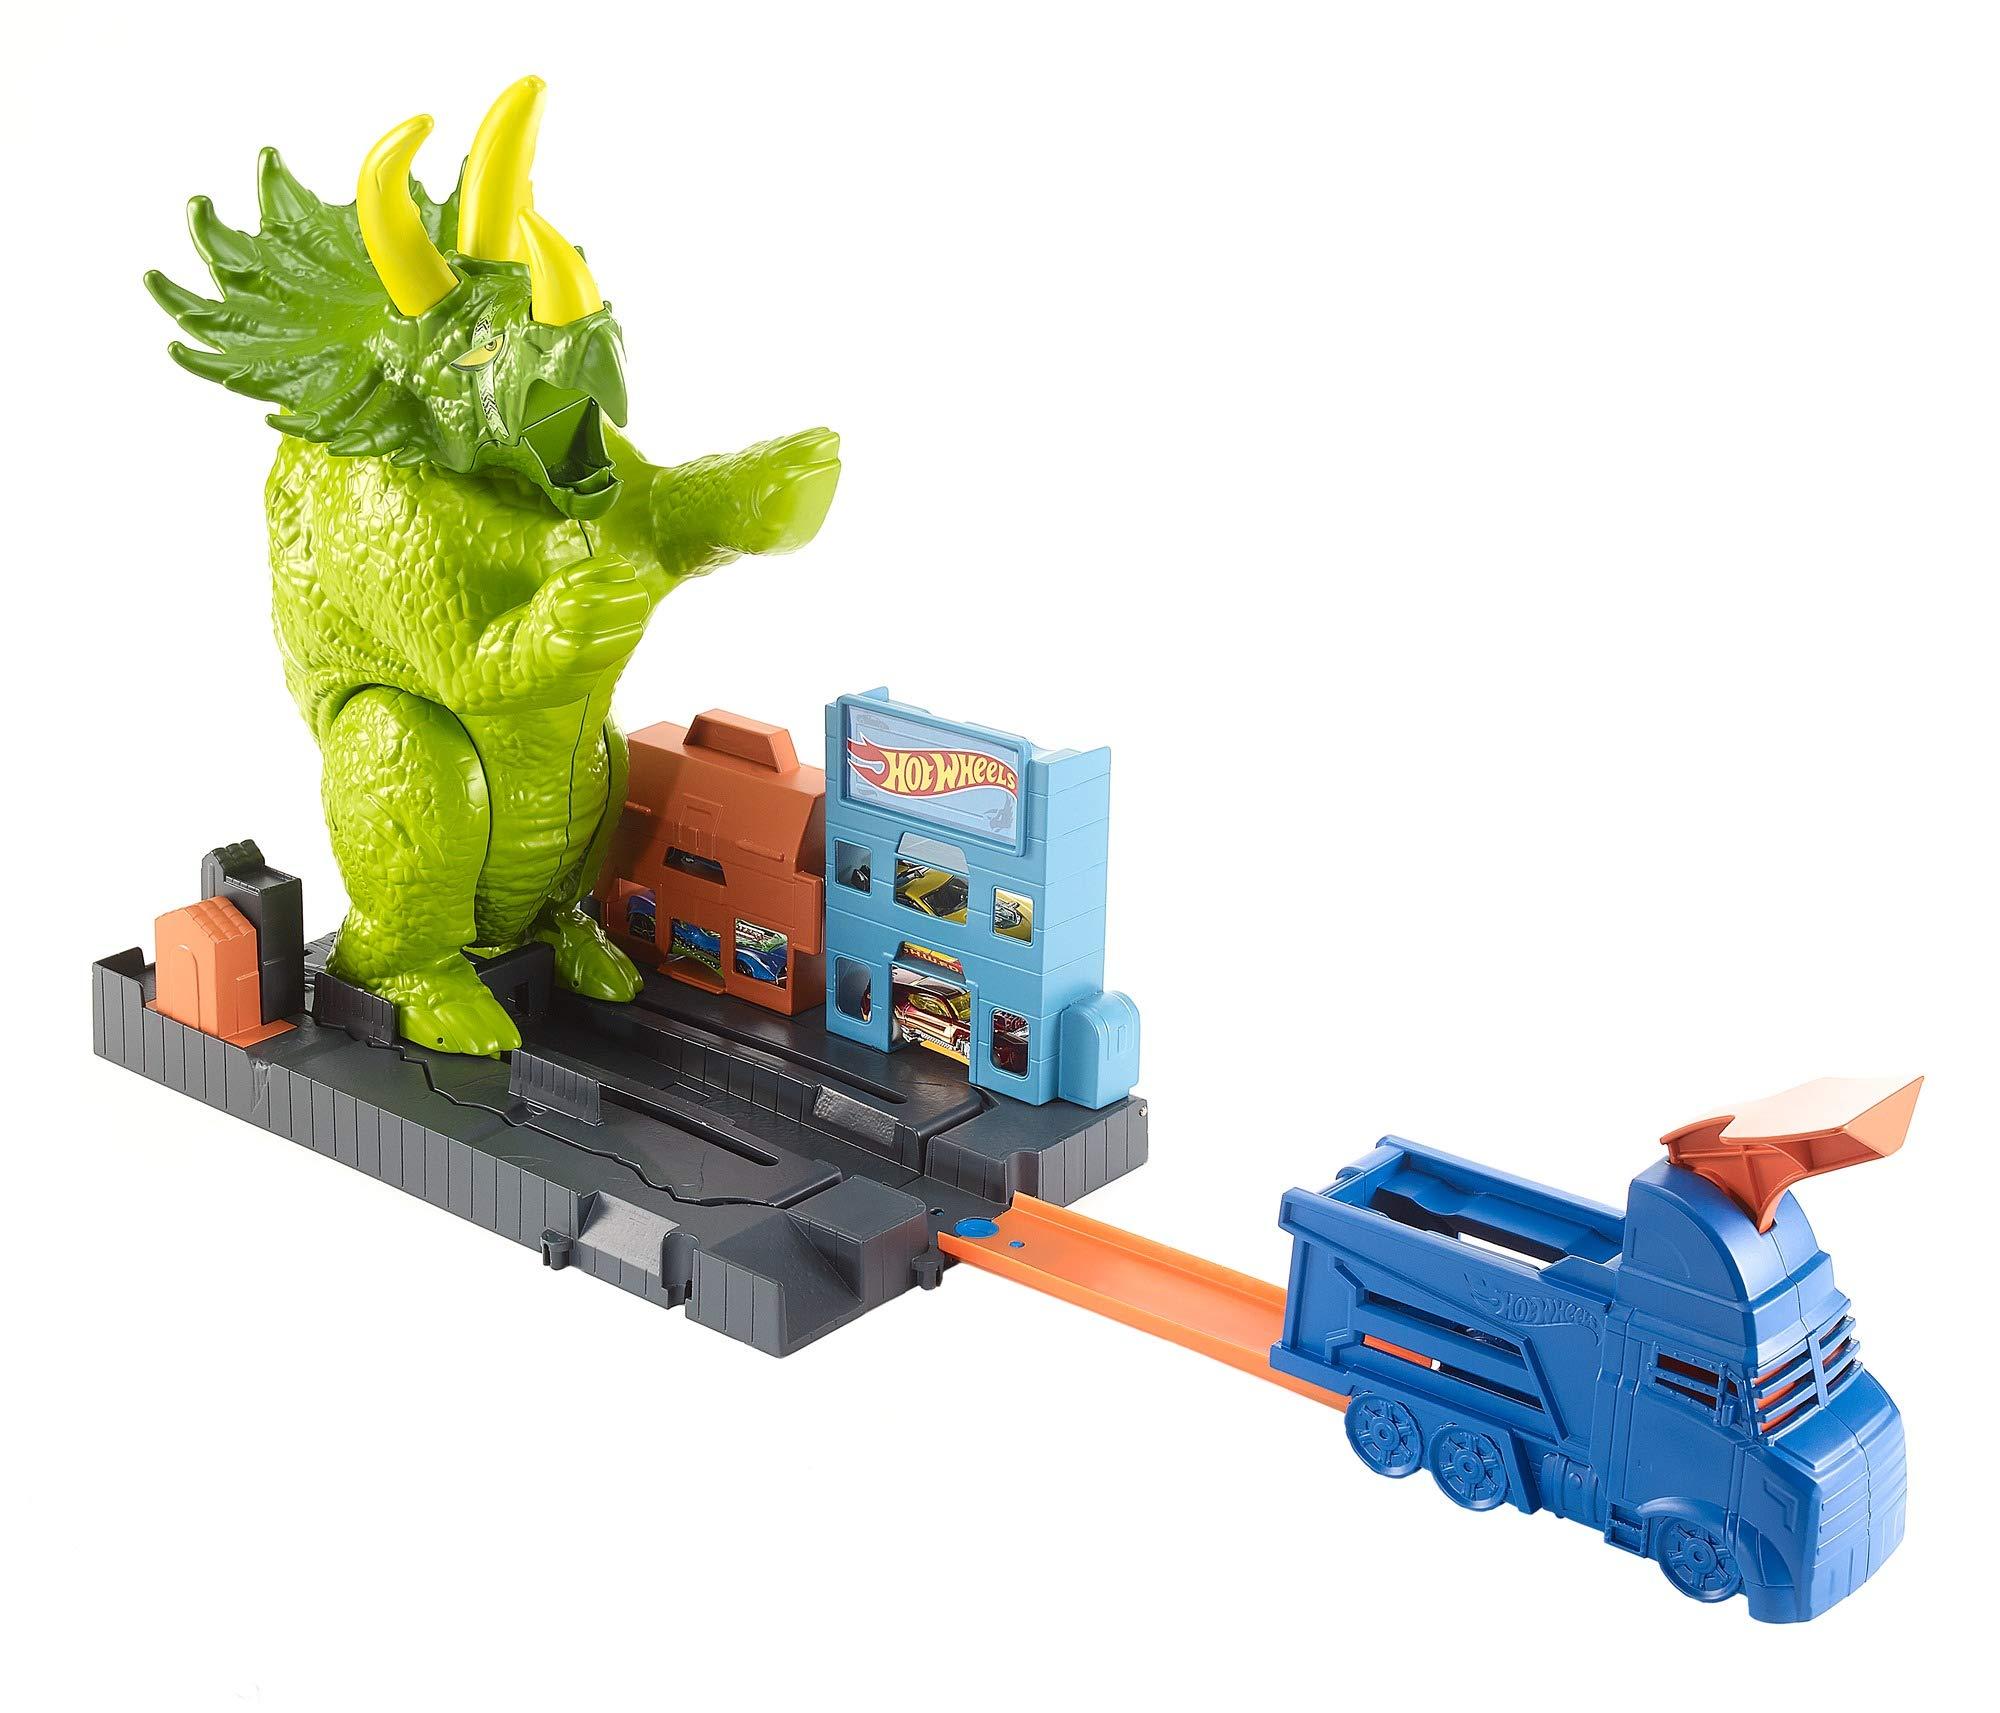 Hot Wheels GBF97 Triceratops Play Set Launcher Vehicle, Giant Dinosaur Nemesis, Multicolour